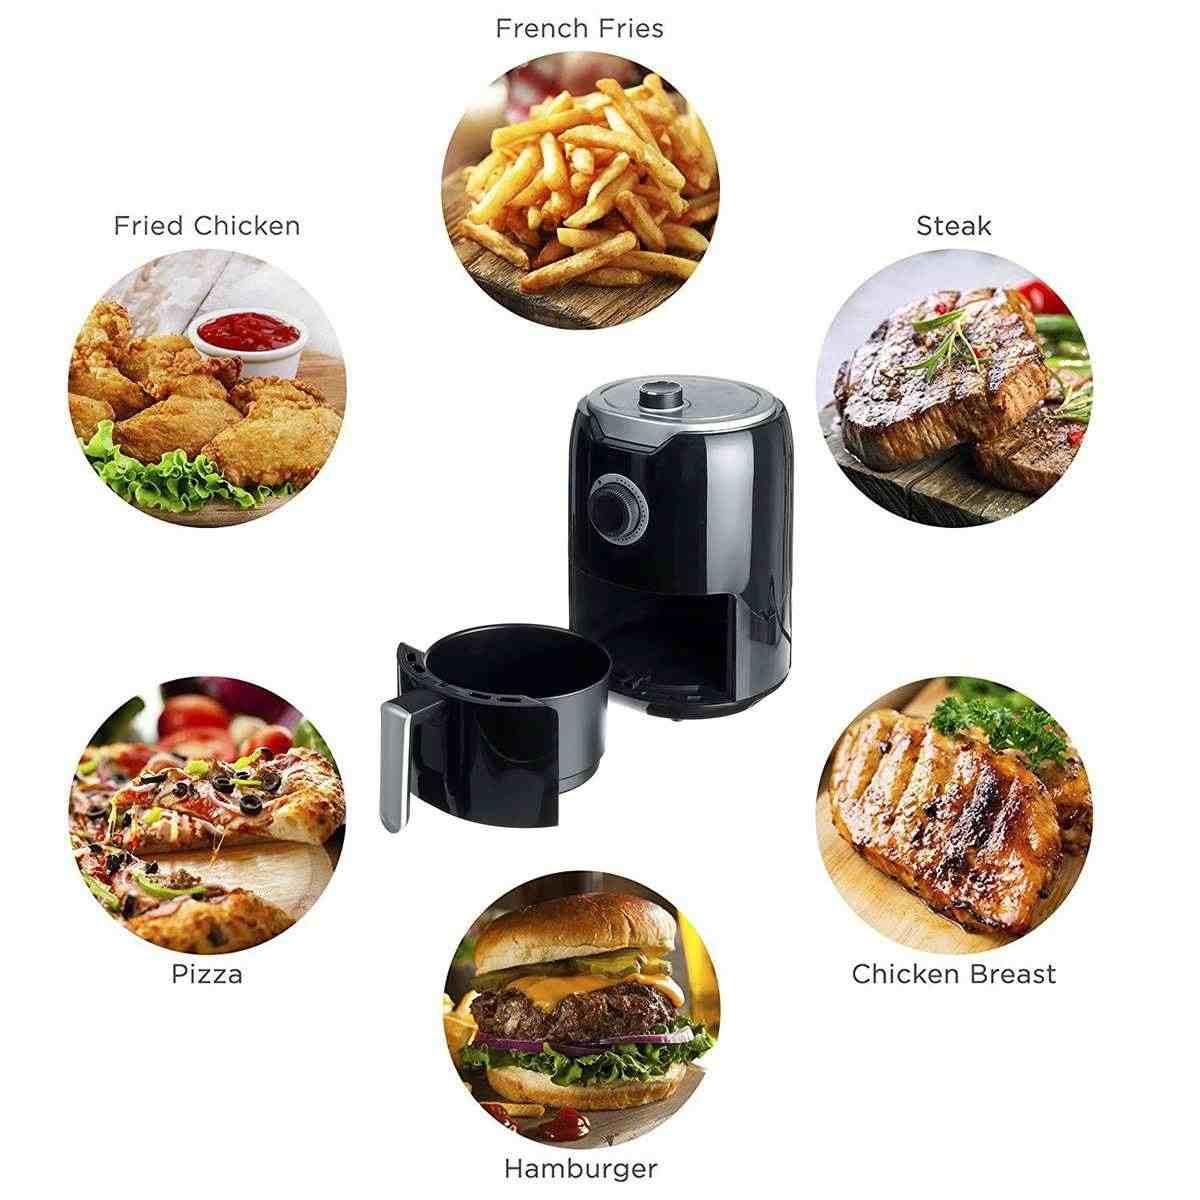 1000W 2Lไฟฟ้าAir FryerจับเวลาอุณหภูมิควบคุมPower Air Fryerไฟฟ้าในครัวเรือนHealthy Kitchenเครื่องมือทำอาหาร